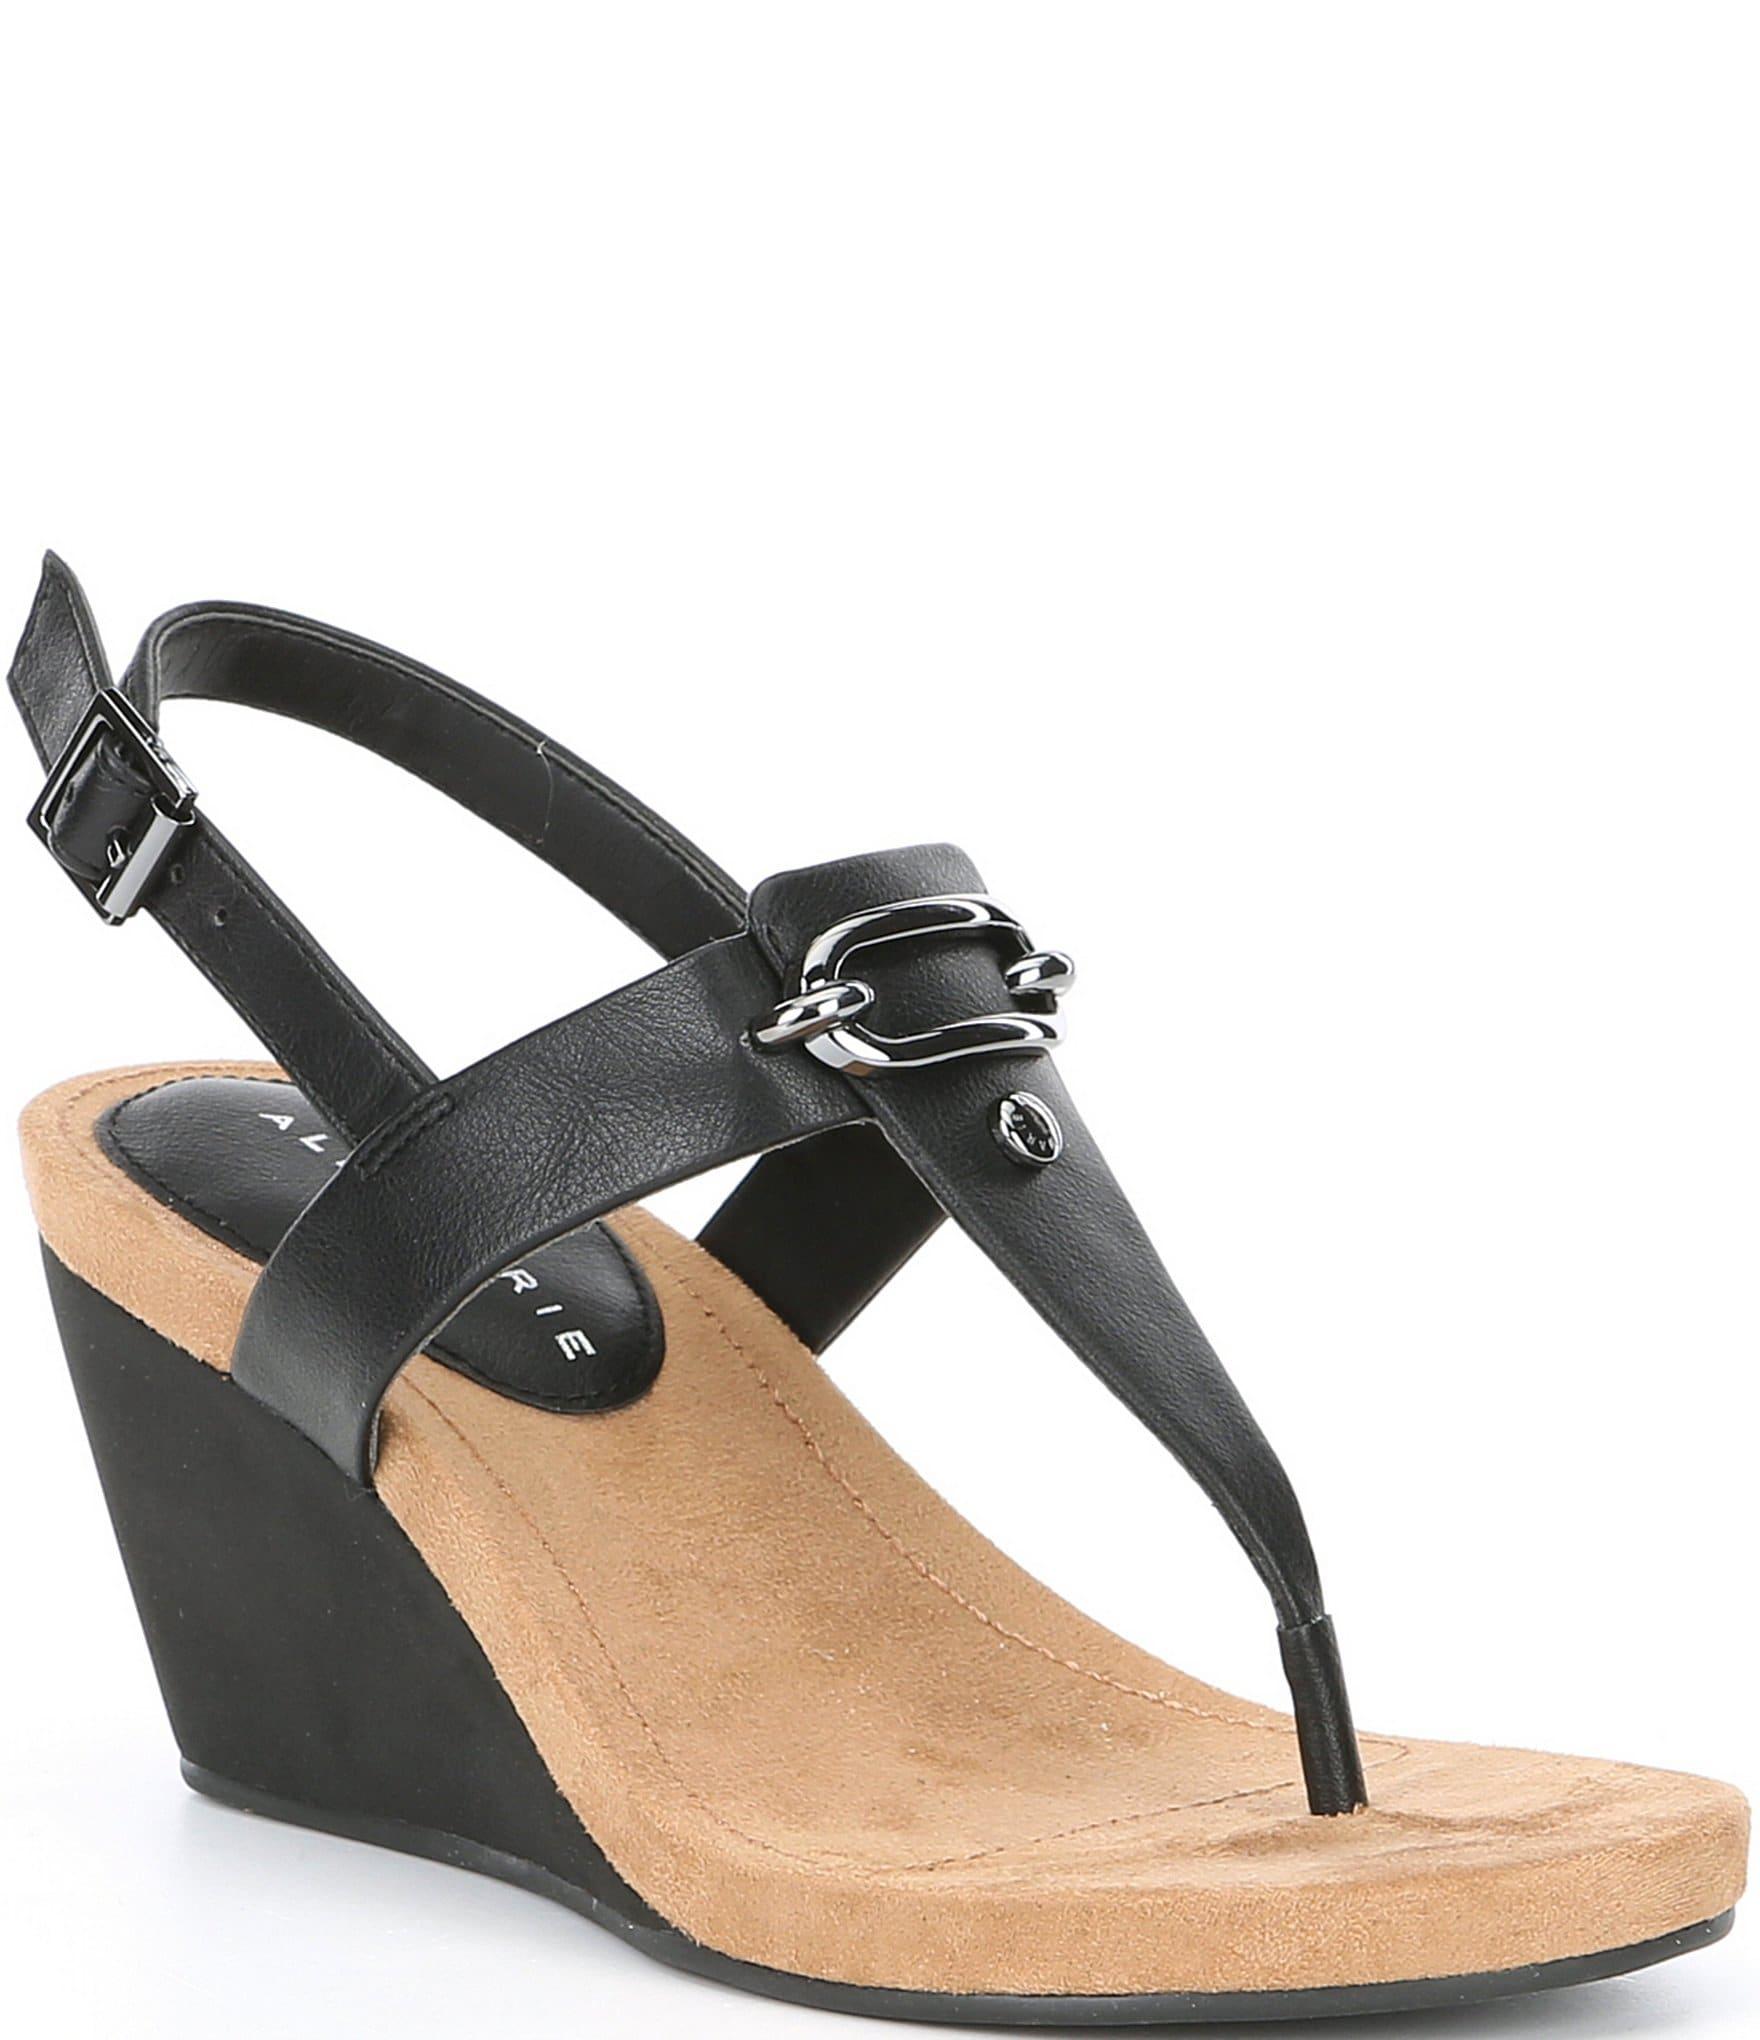 Alex Marie Burdette Thong Wedge Sandals Dillard S